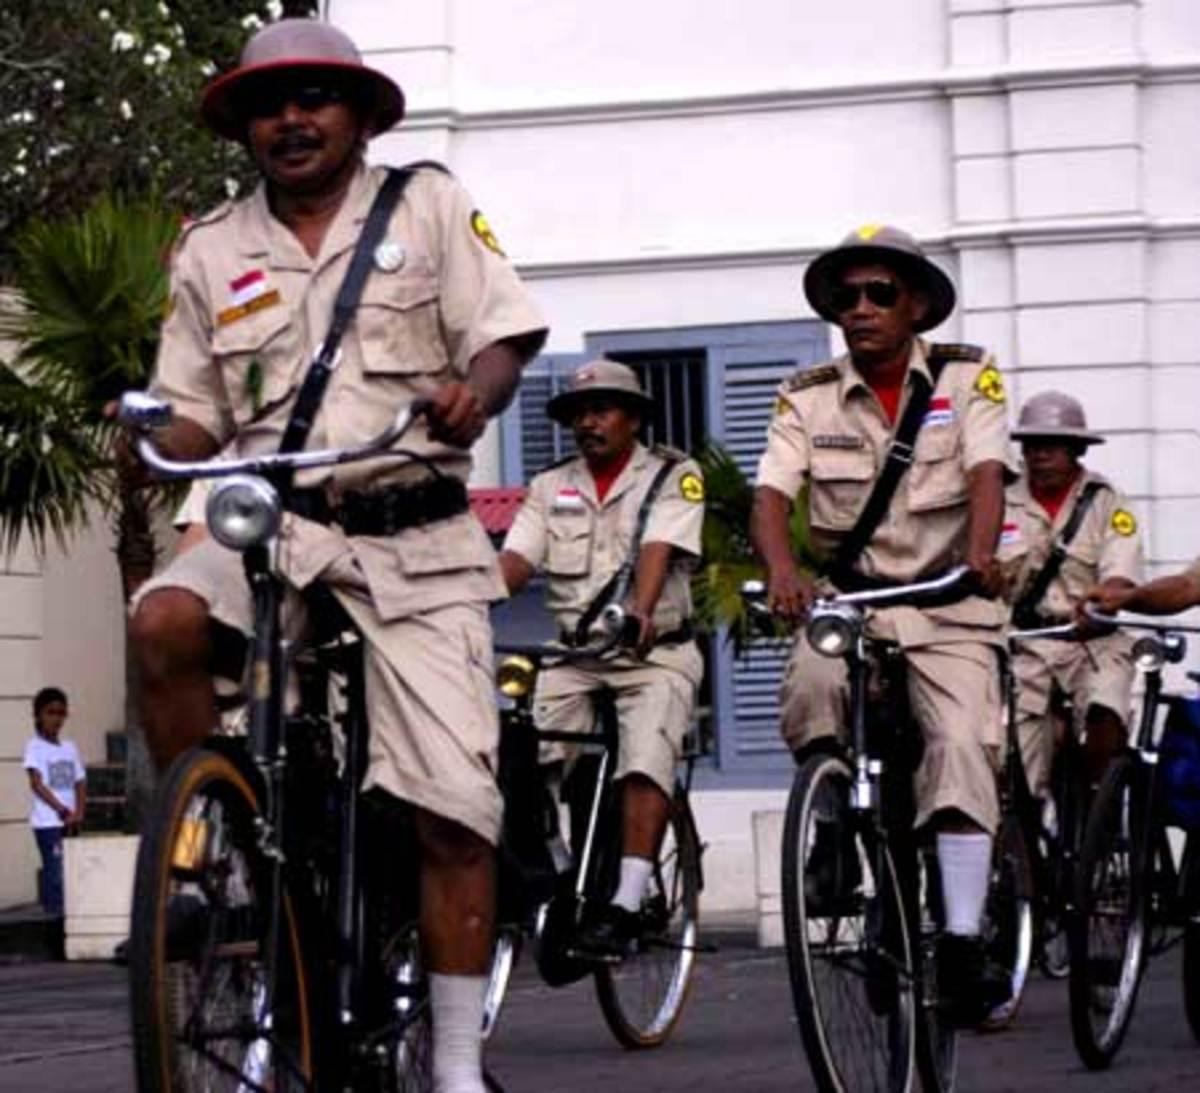 Yogya old bicycle club with their uniform. Indonesia people loves old bicycle